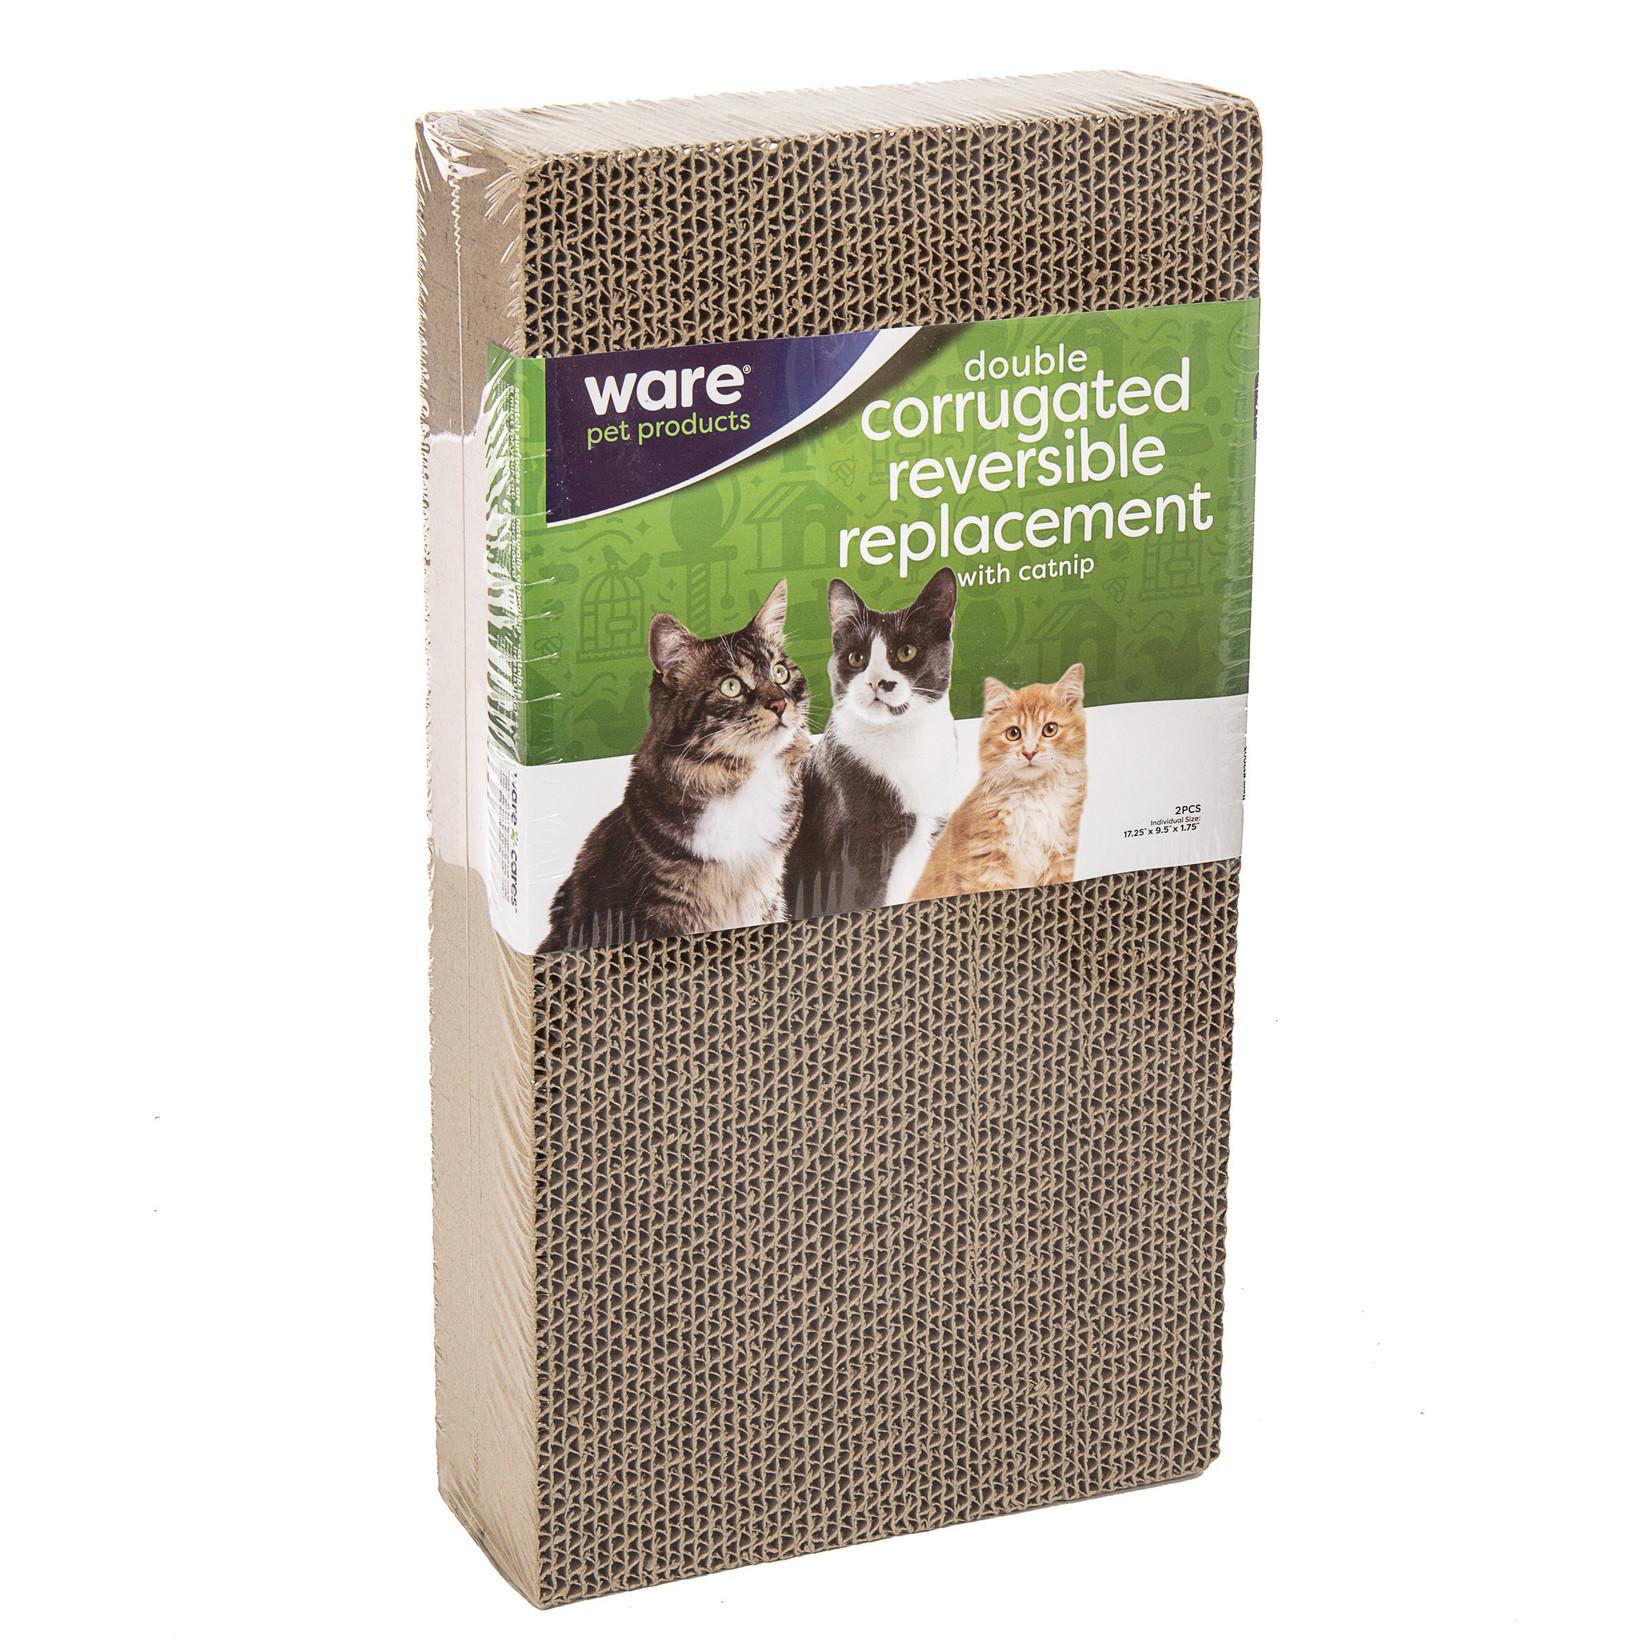 Cat Scratcher Corrugated Reversible Replacement + catnip  Double 2pcs